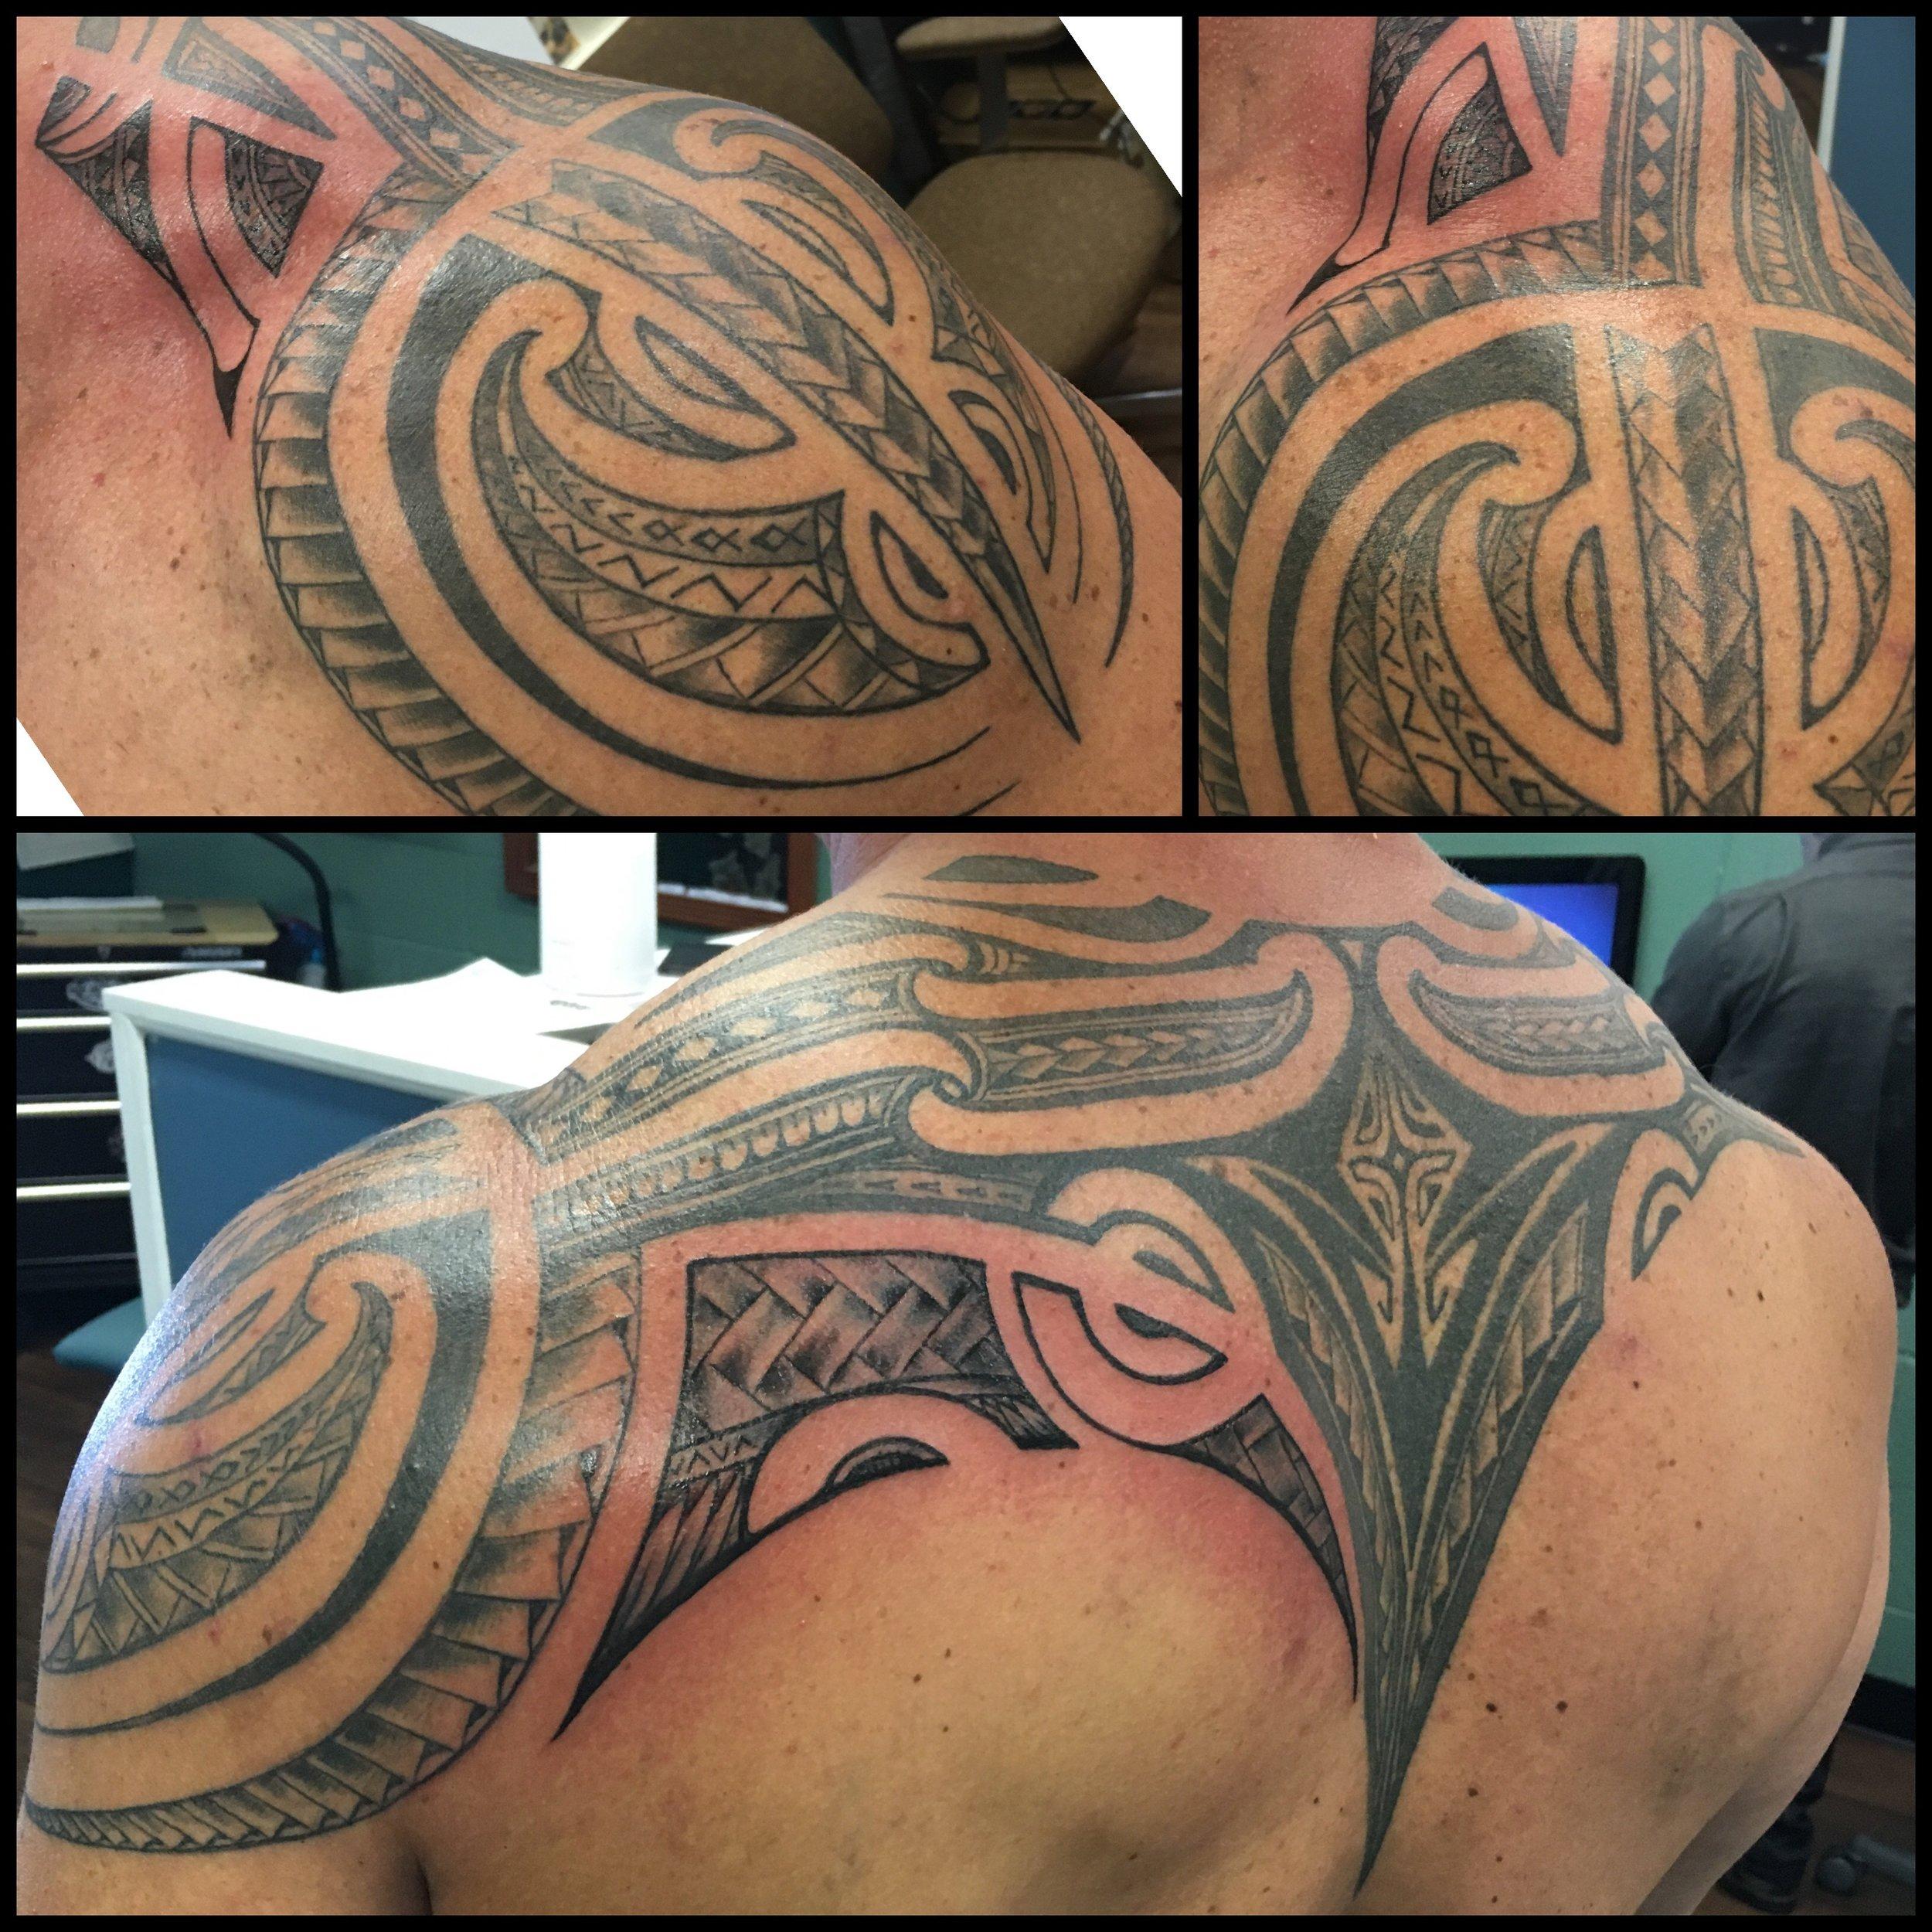 Freehand Polynesian Tribal Shoulder and Back Tattoo by Jon Poulson - Aloha Salt Lake Tattoos